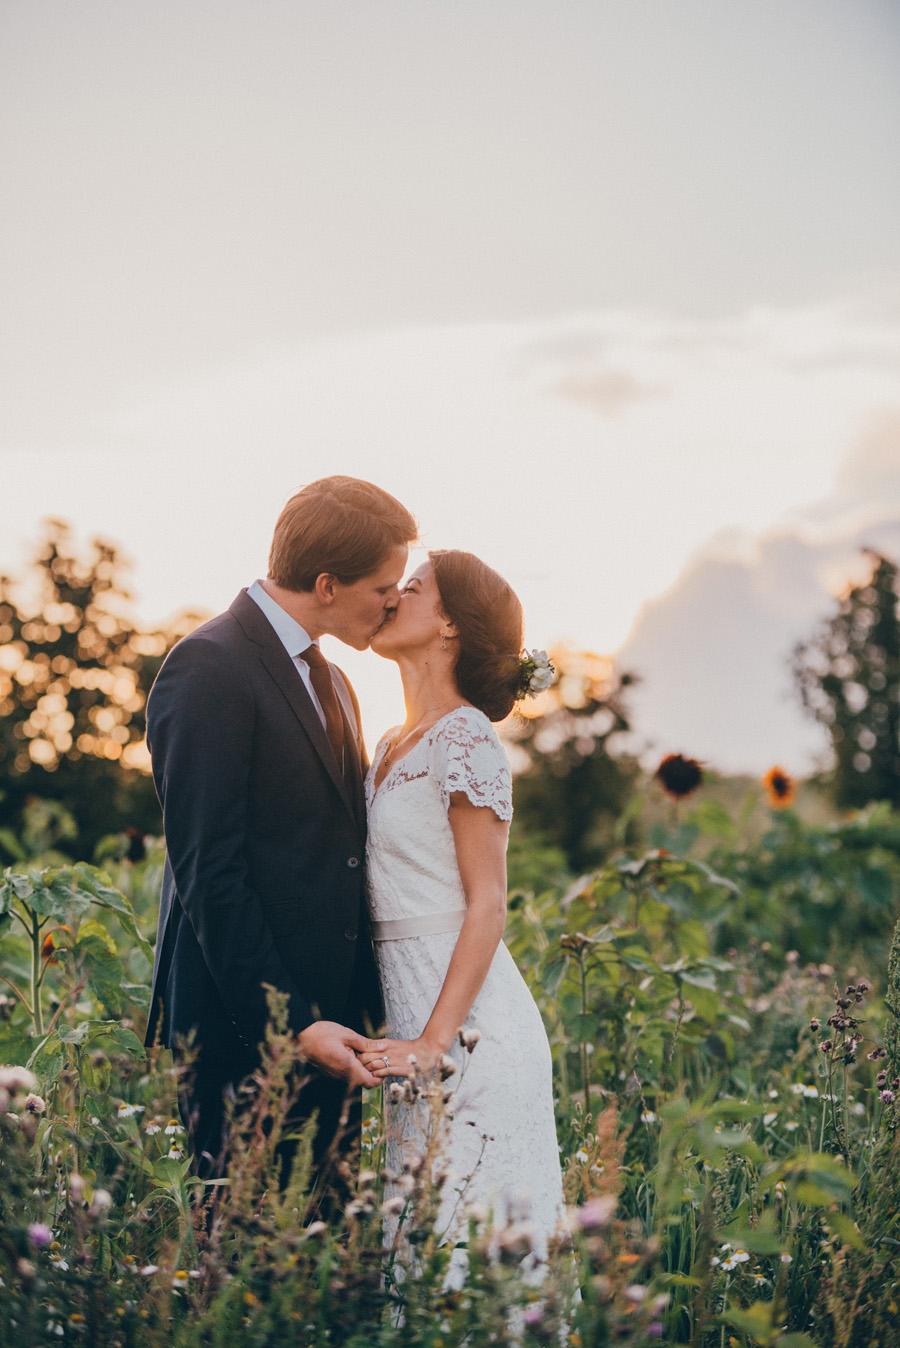 zetterbergcouture,katrinetorp,middag,bröllopsfotograf,skåne